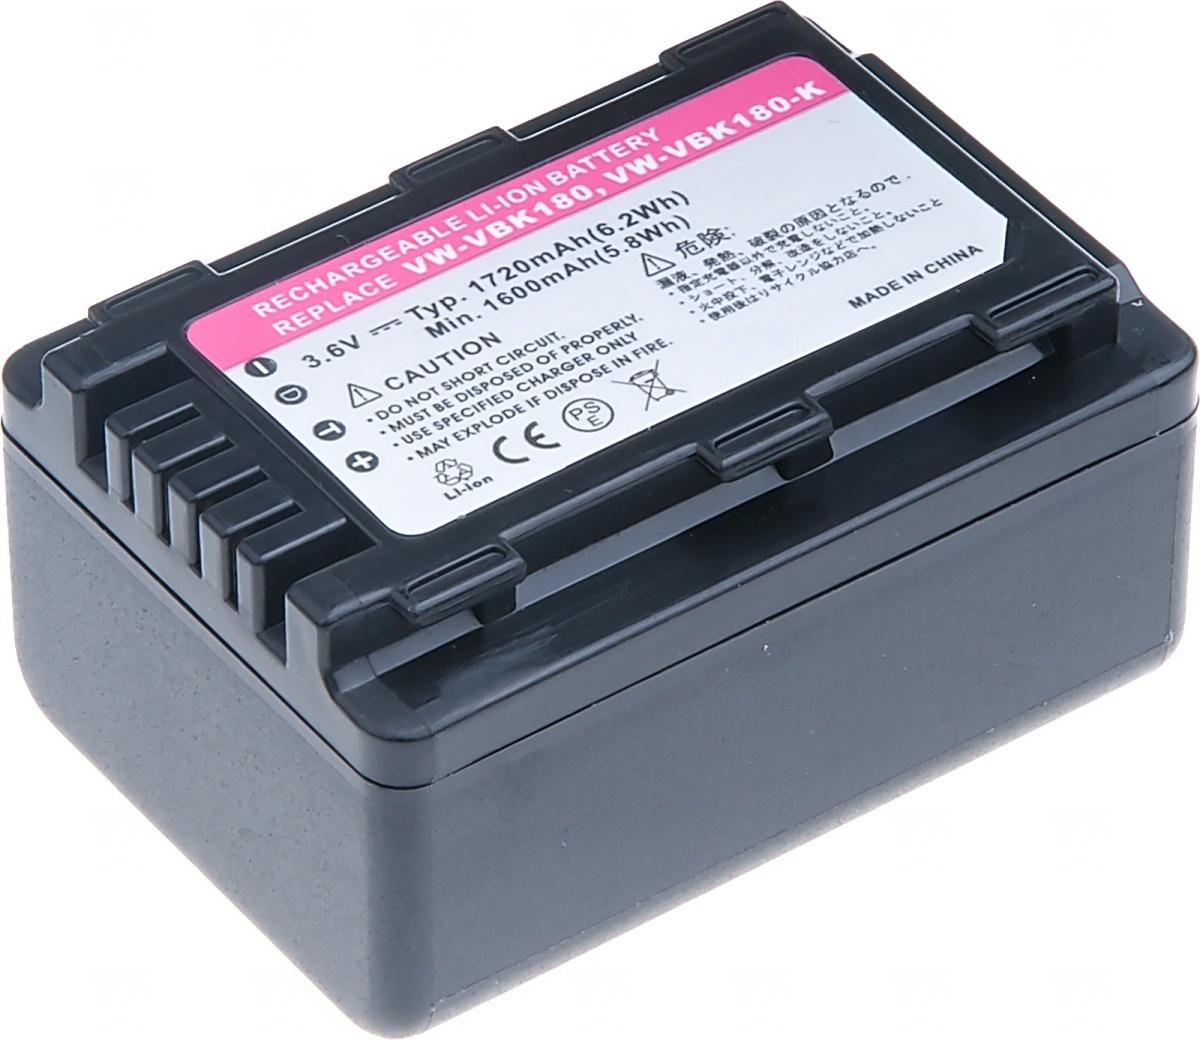 Baterie T6 power Panasonic VW-VBK180, 1720mAh, černá